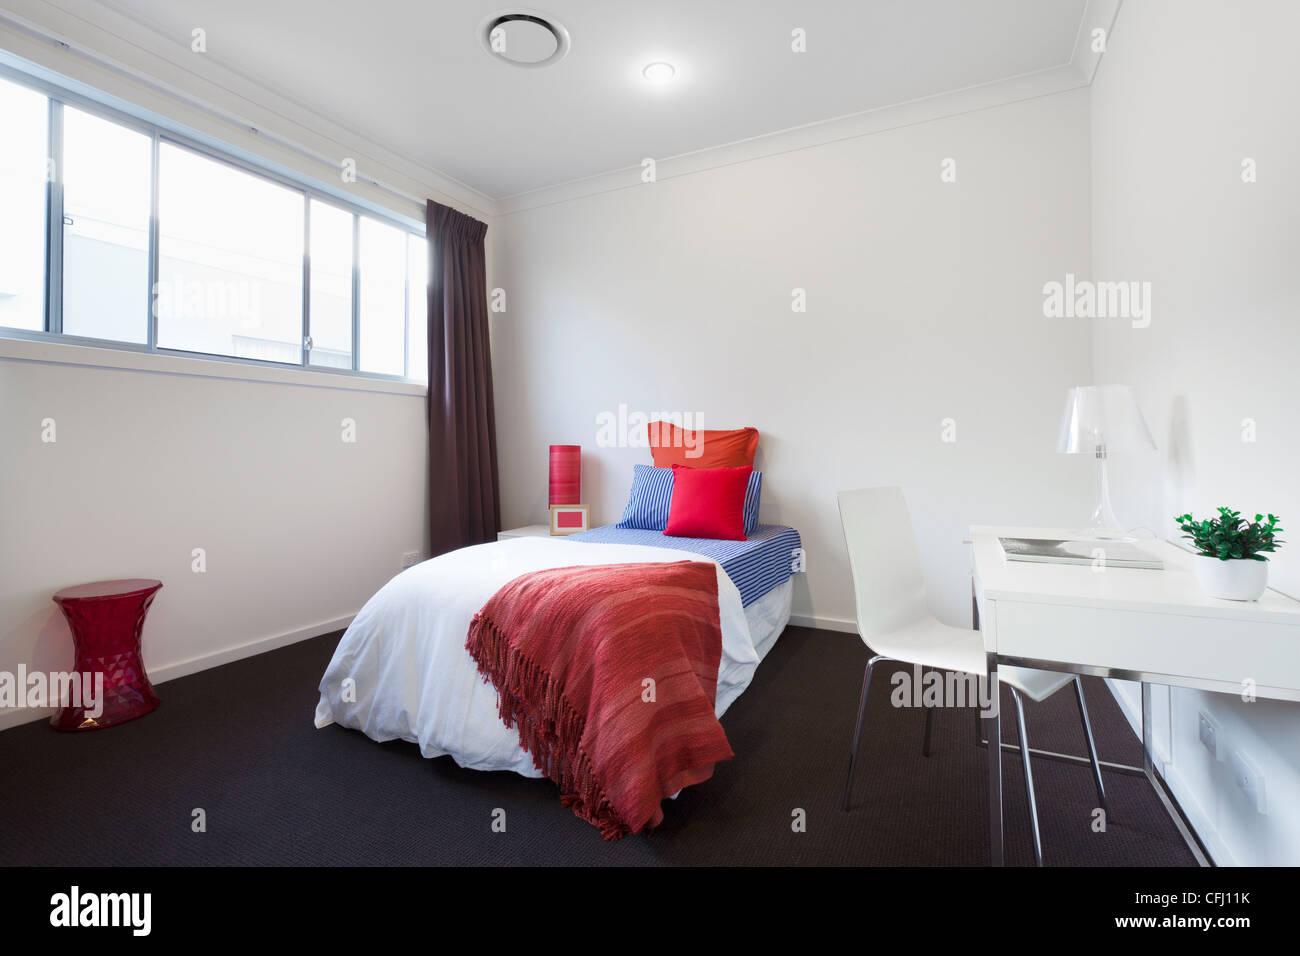 White Walls Bedroom Stockfotos & White Walls Bedroom Bilder - Alamy